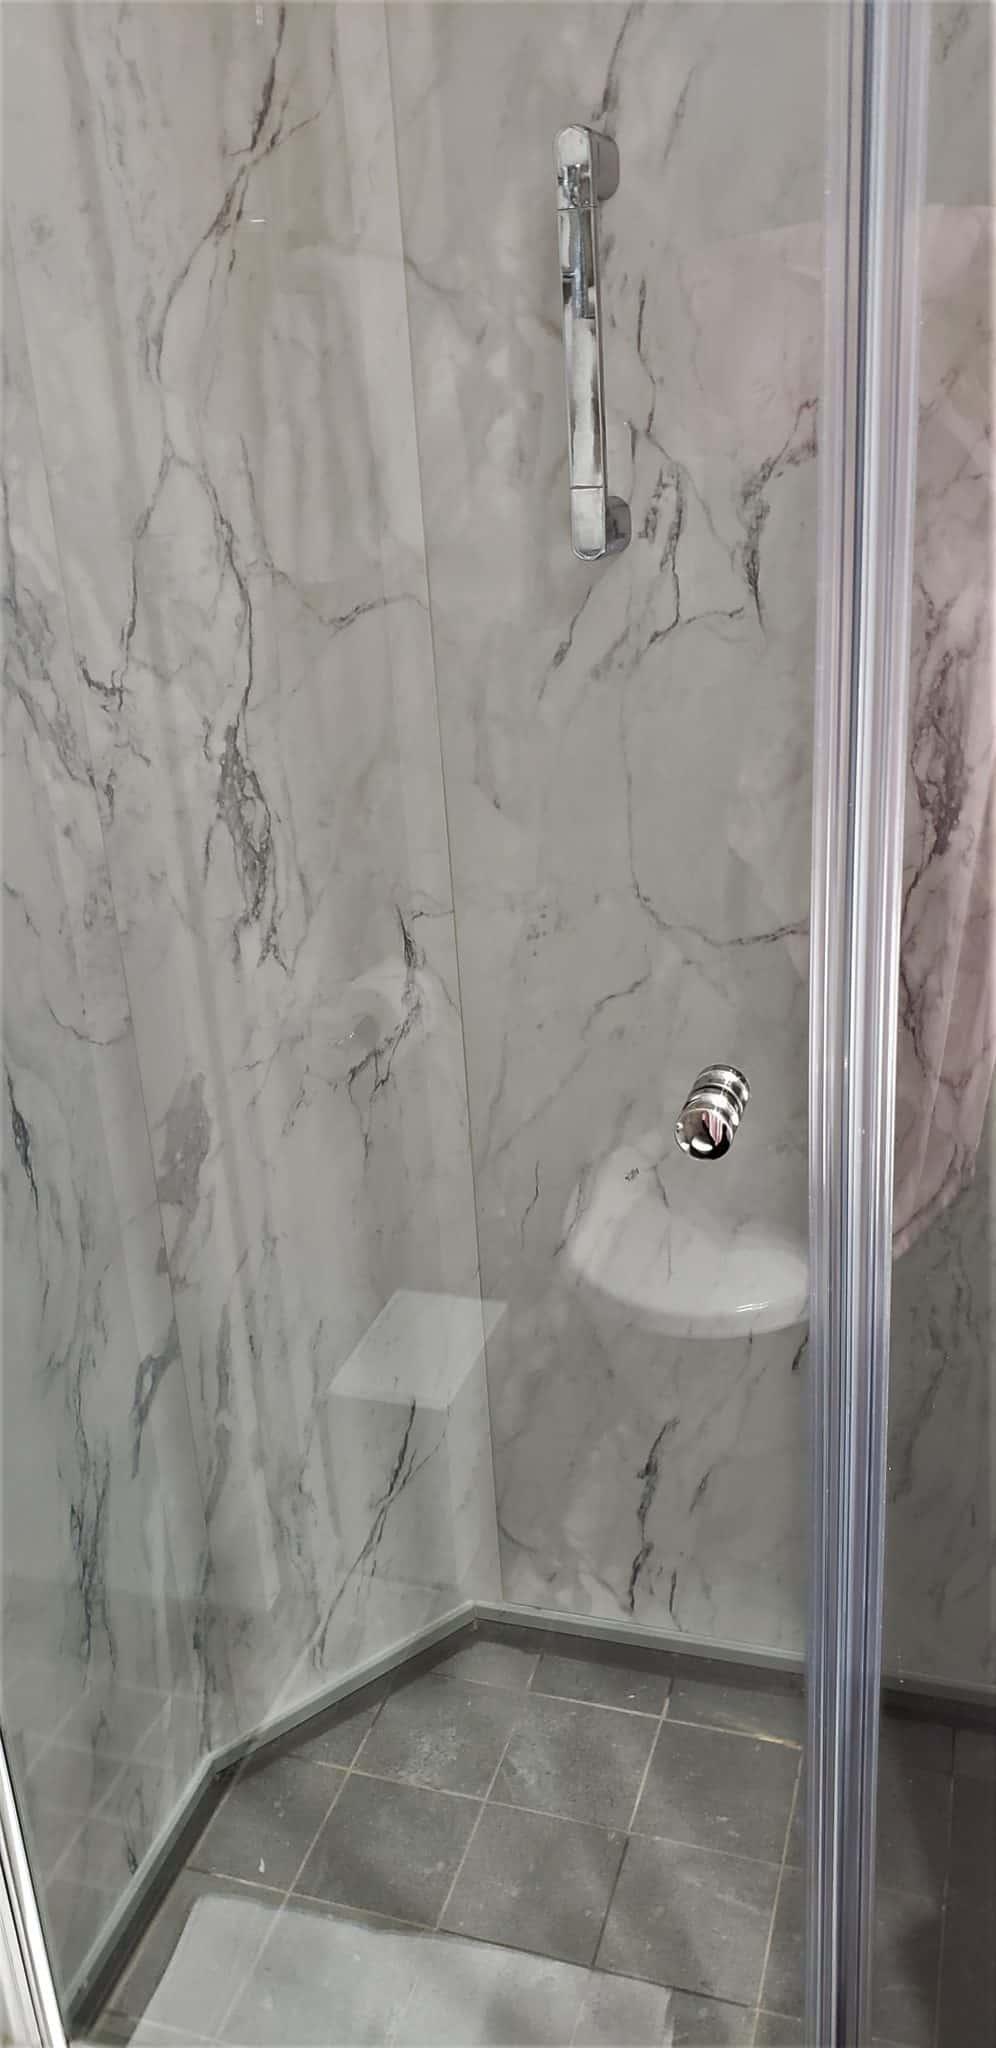 aquaclass celebrity millennium cabin shower